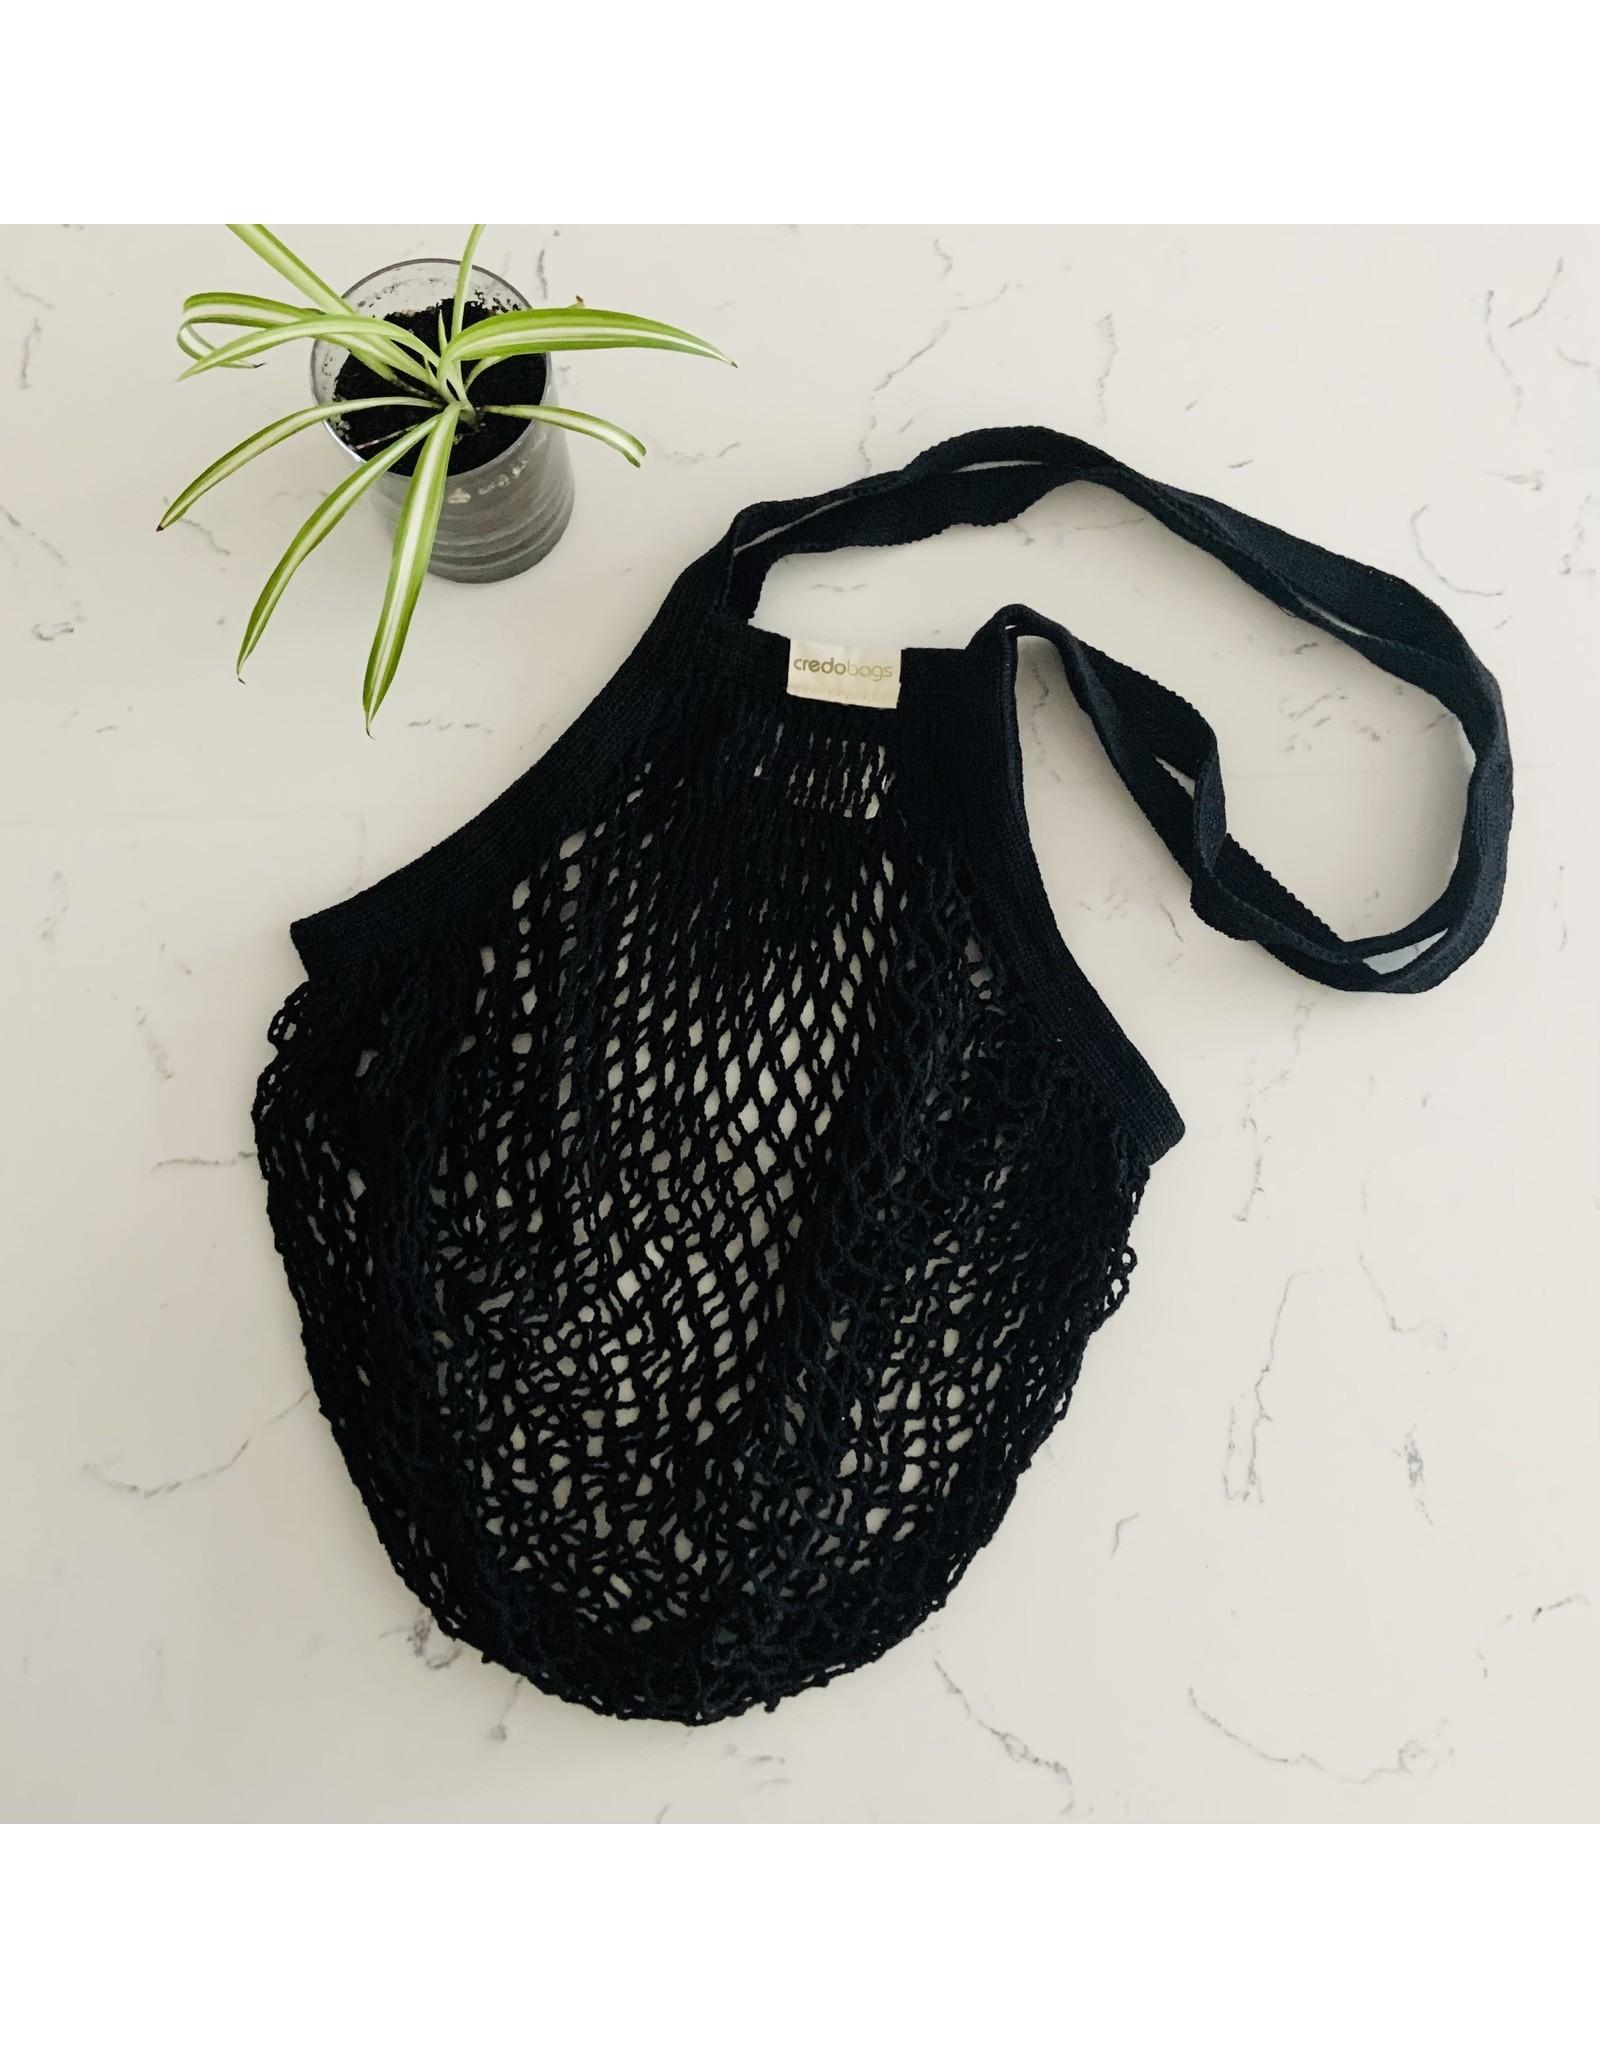 Credo Bags Market String Bag